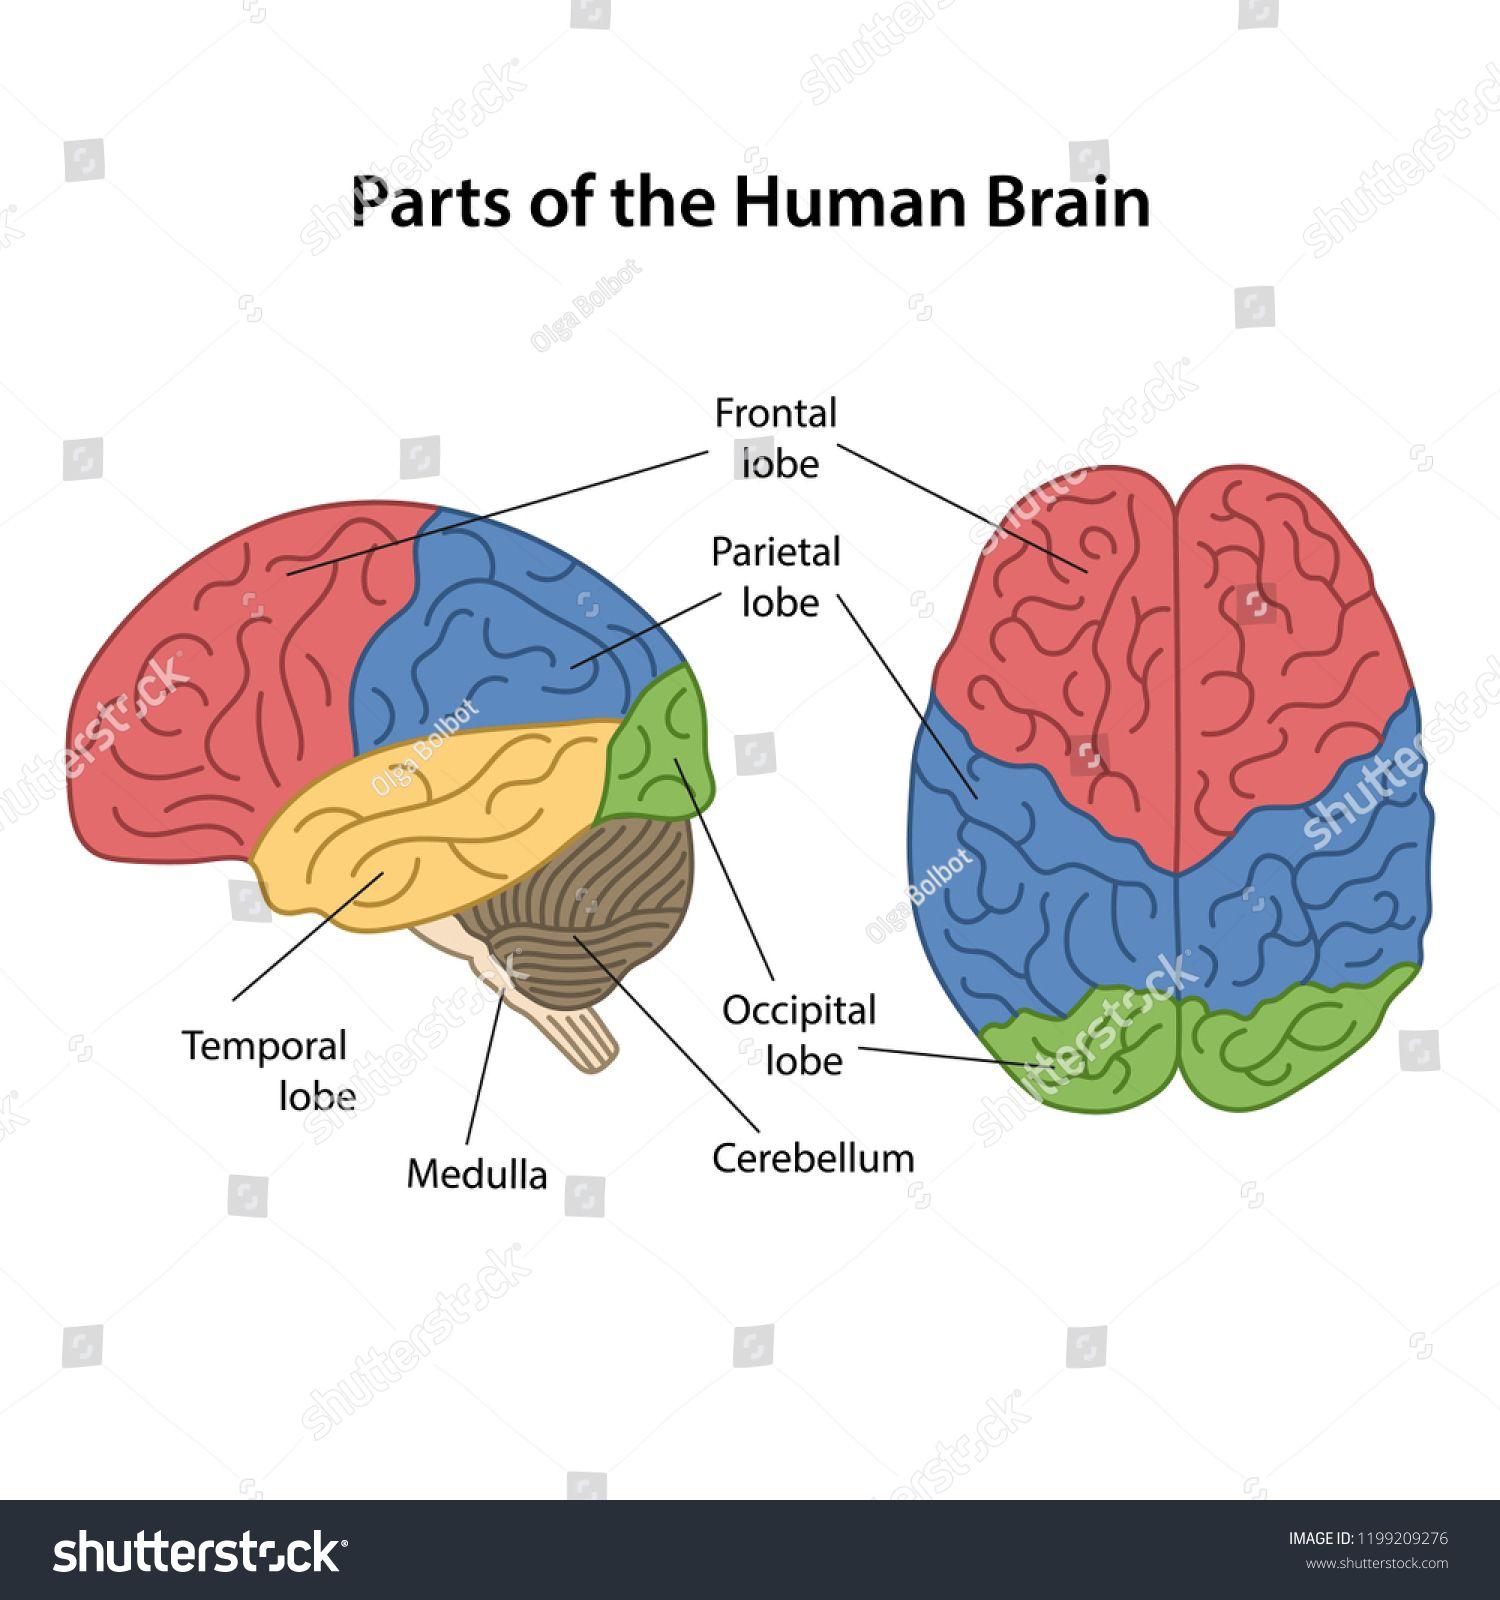 Labeled Diagram Of The Human Brain | Human brain, Human ...